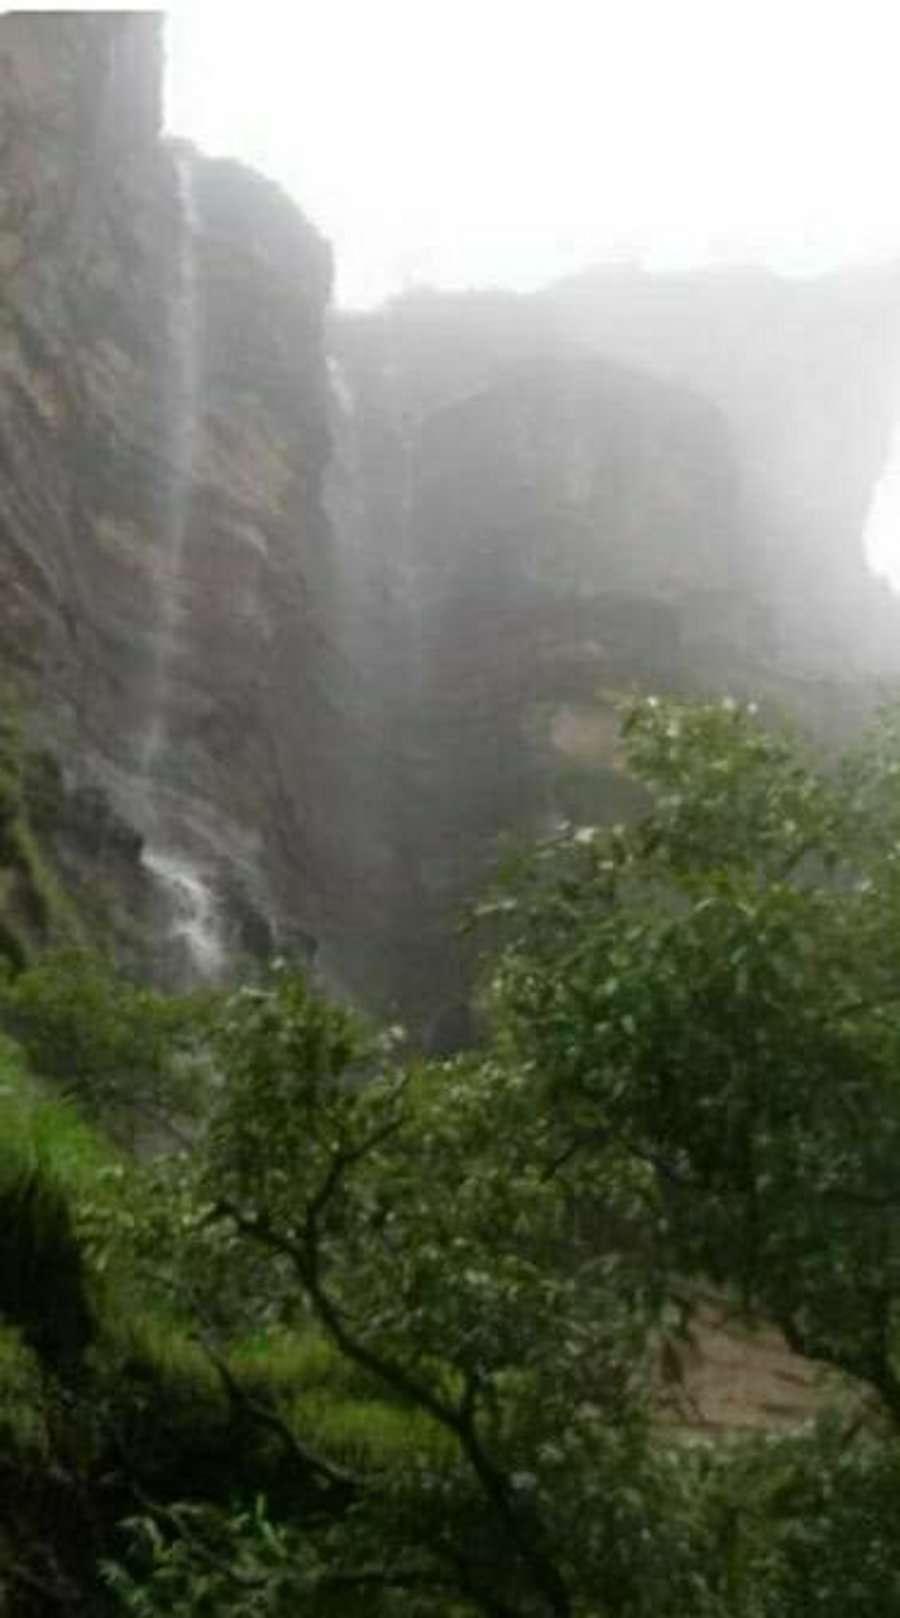 Water filled in Jatashankar temple due to rain in Pachmarhi